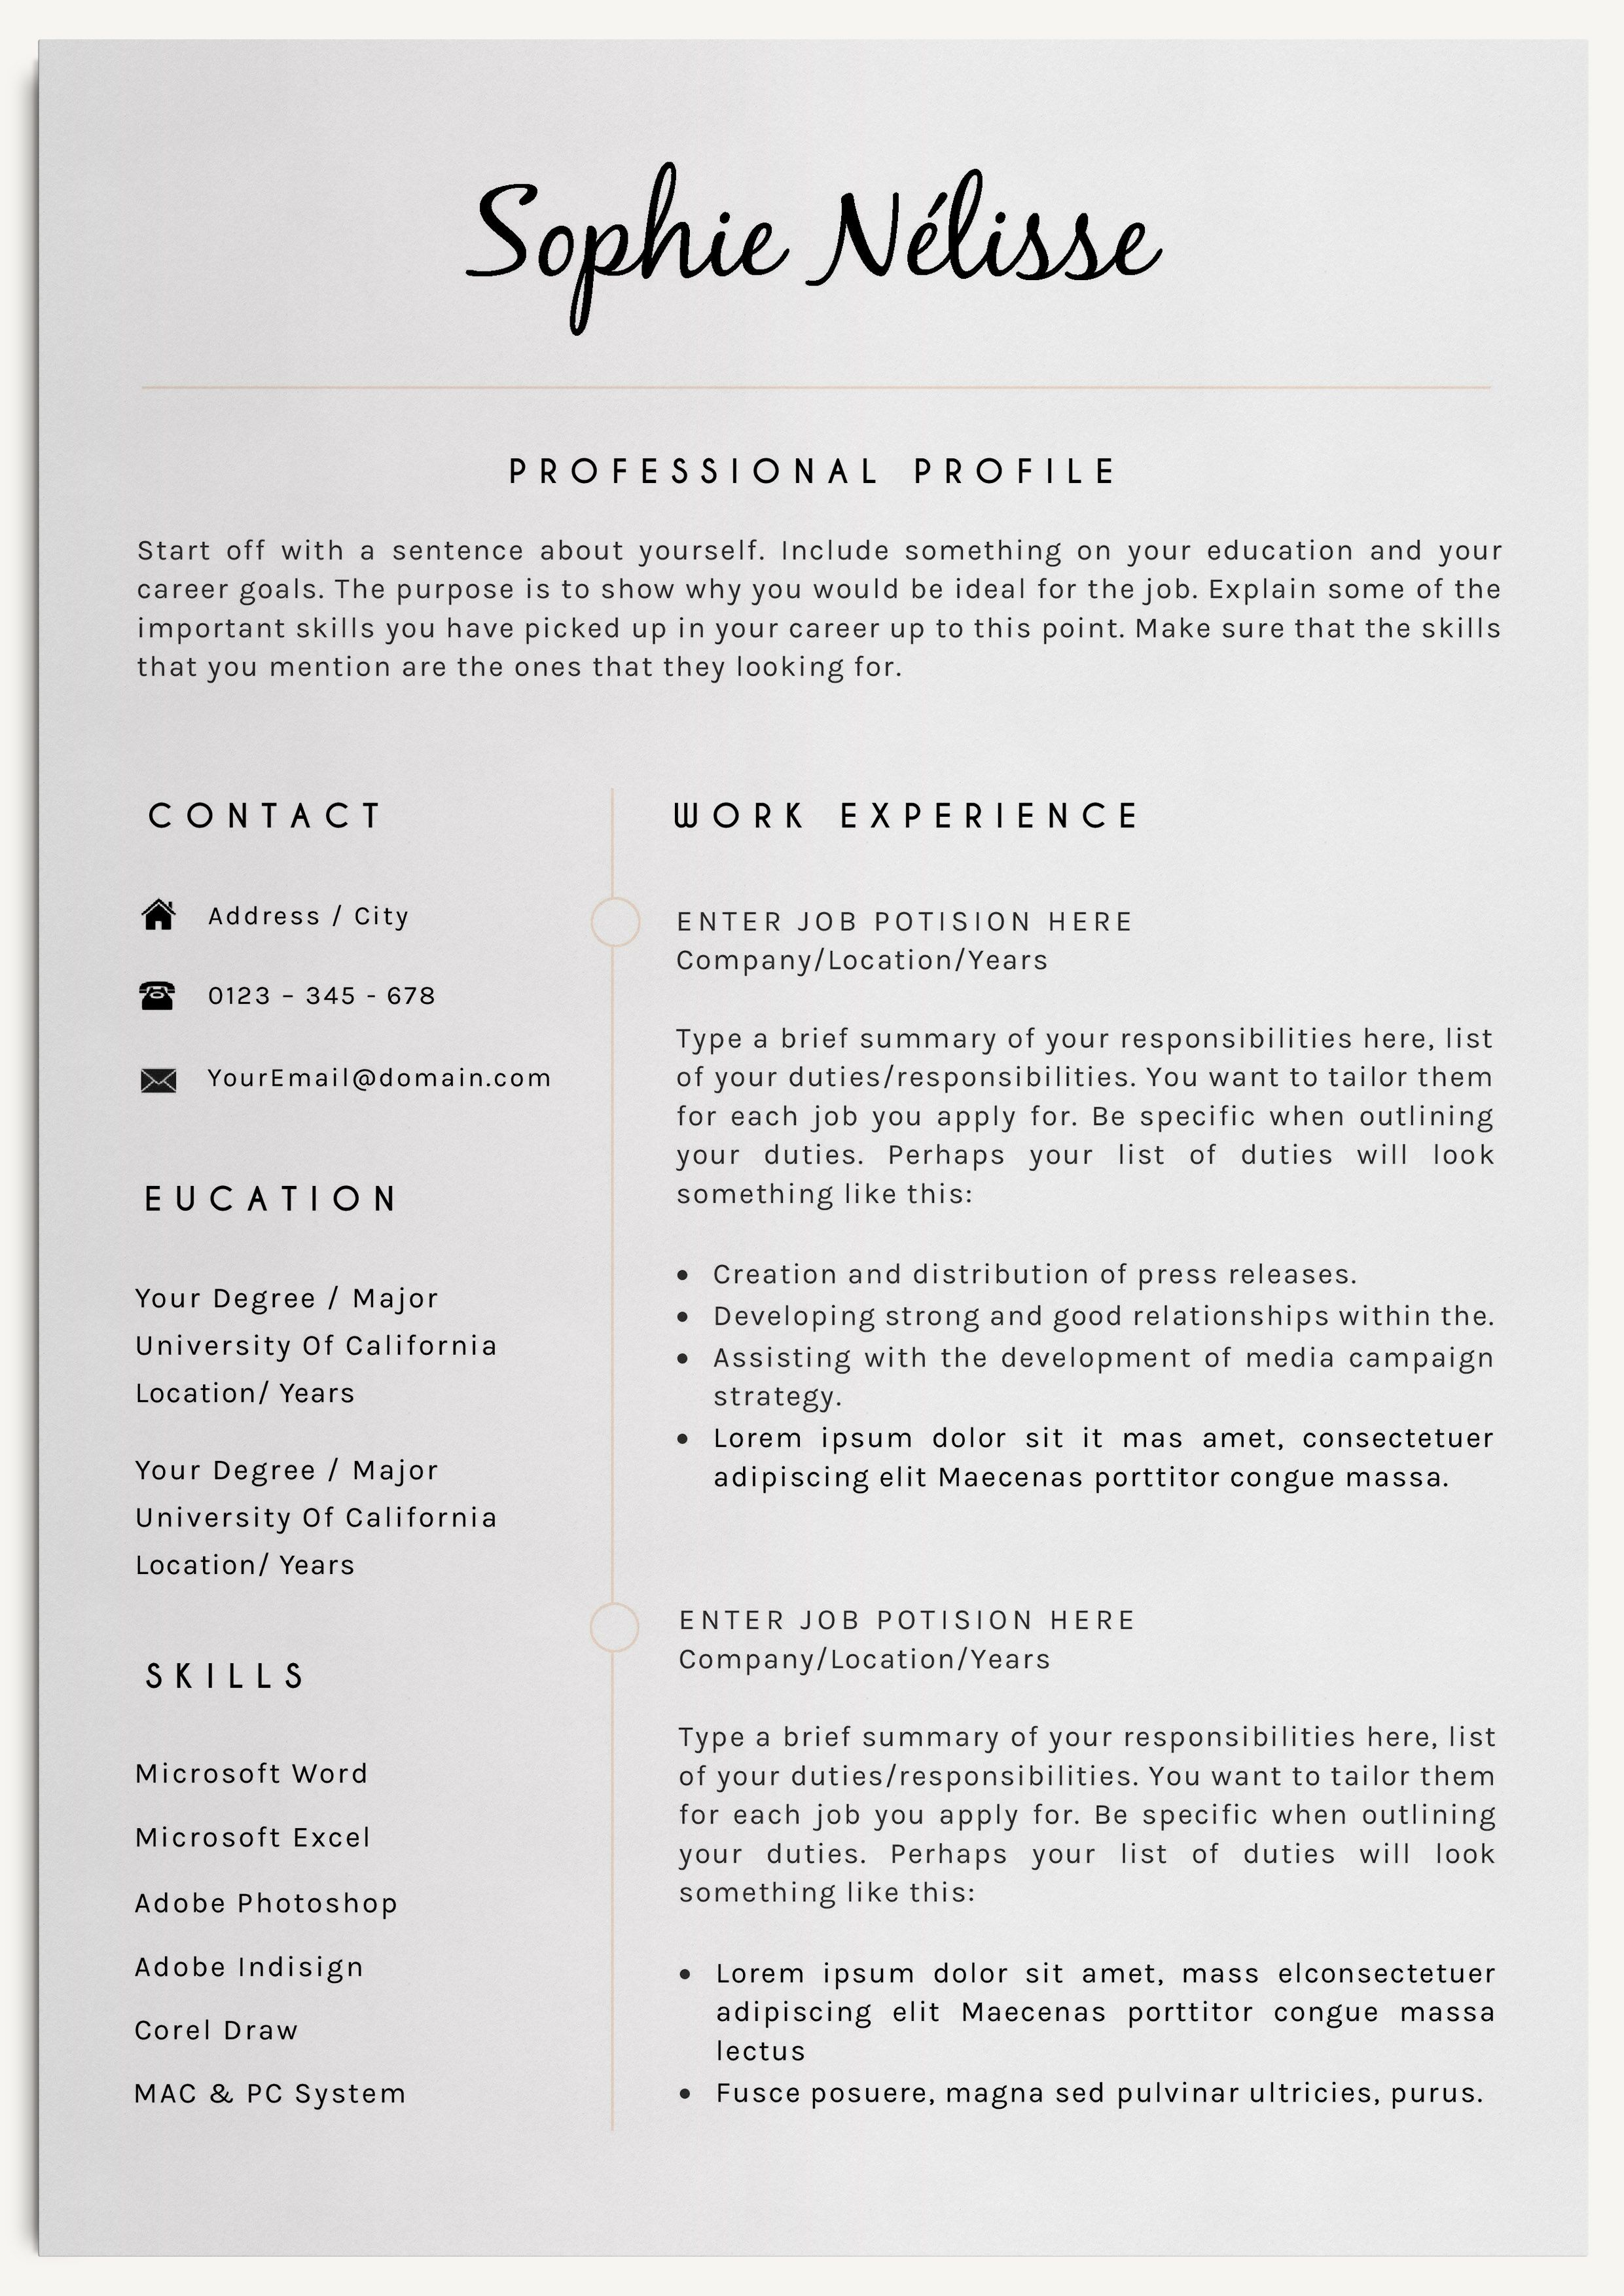 Professional Resume Template Good Resume Examples Job Resume Resume Template Professional